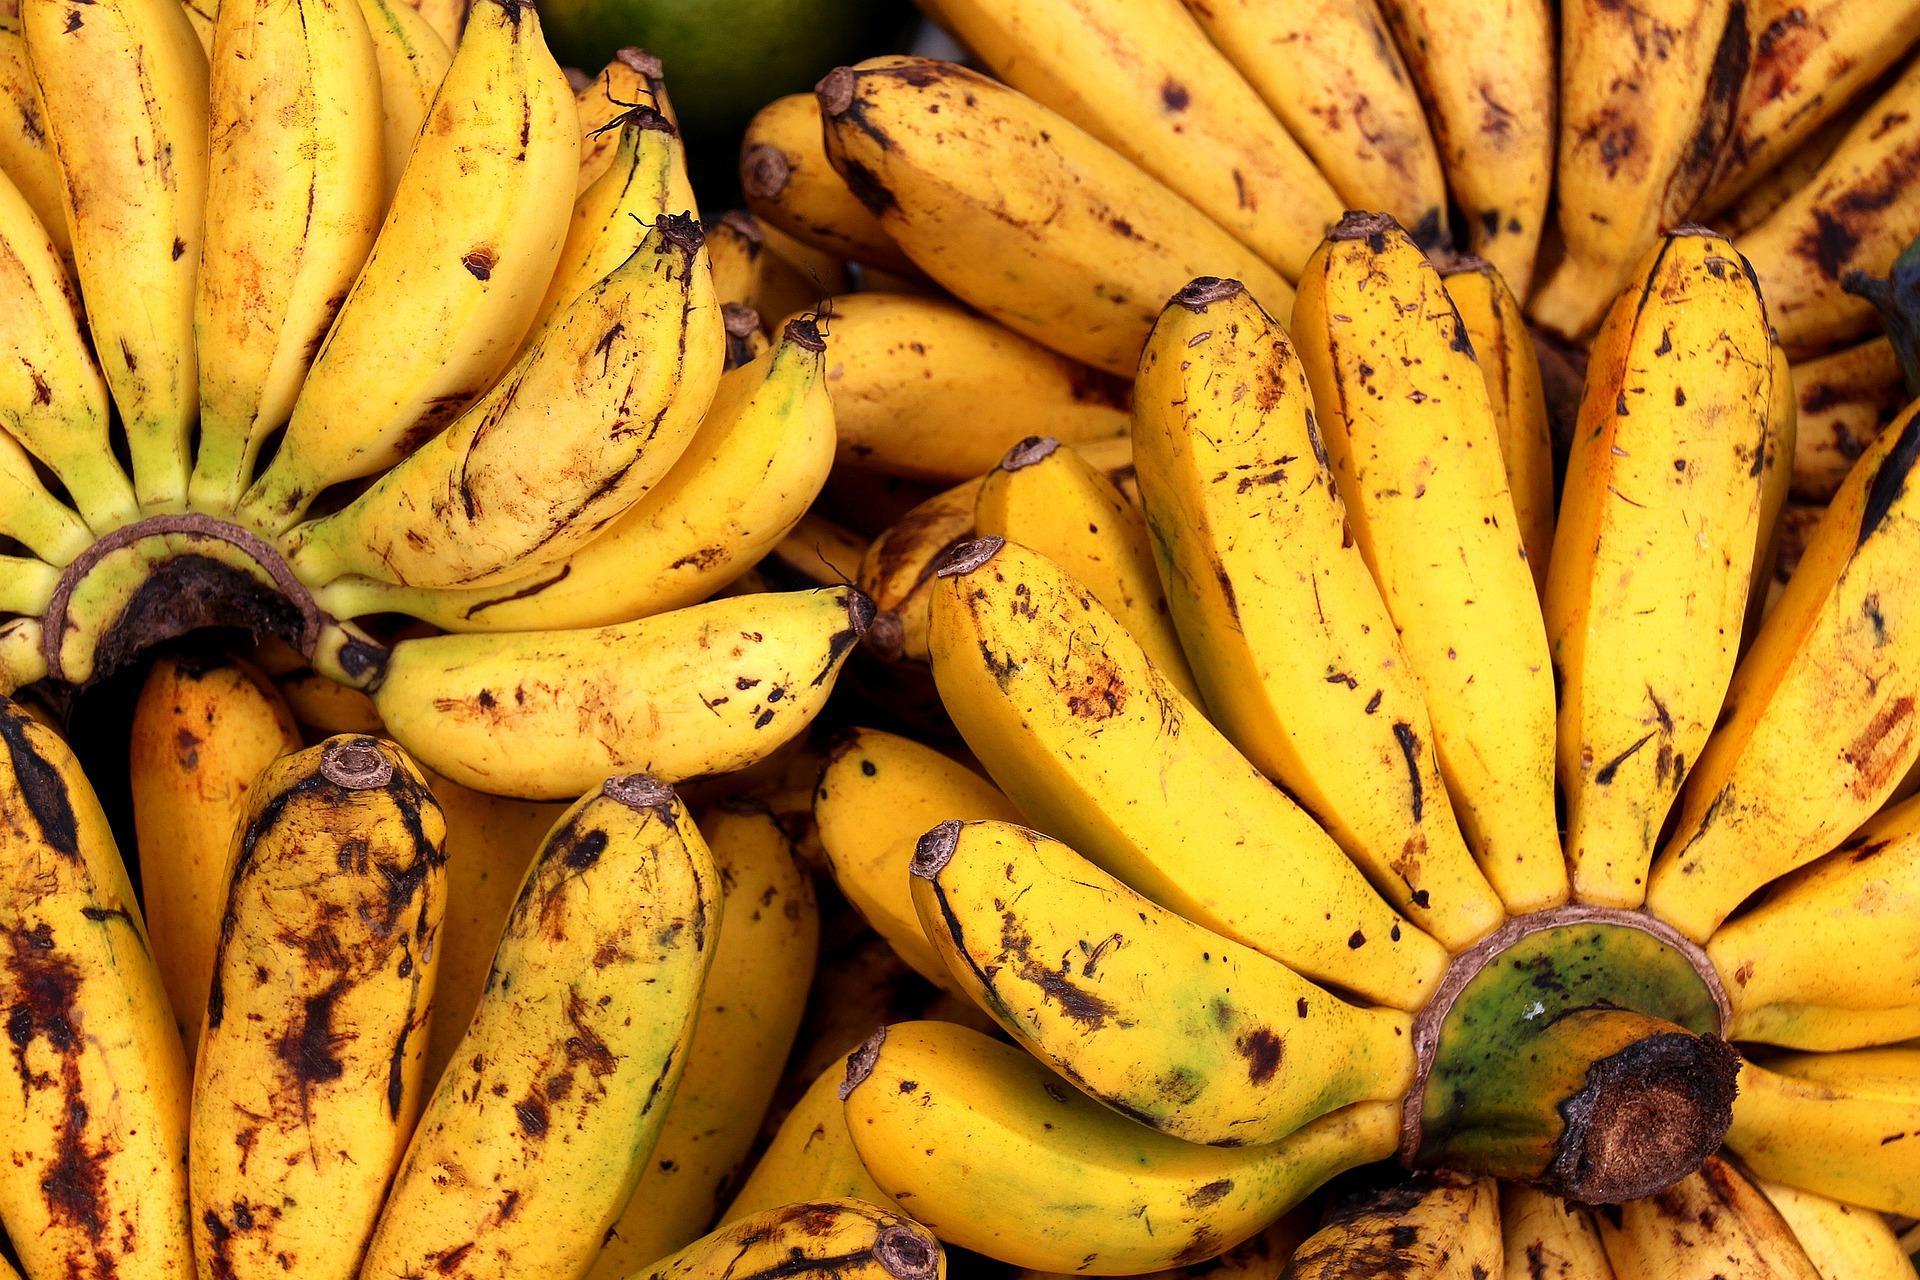 bananas-1774760_1920-1495058504575.jpg